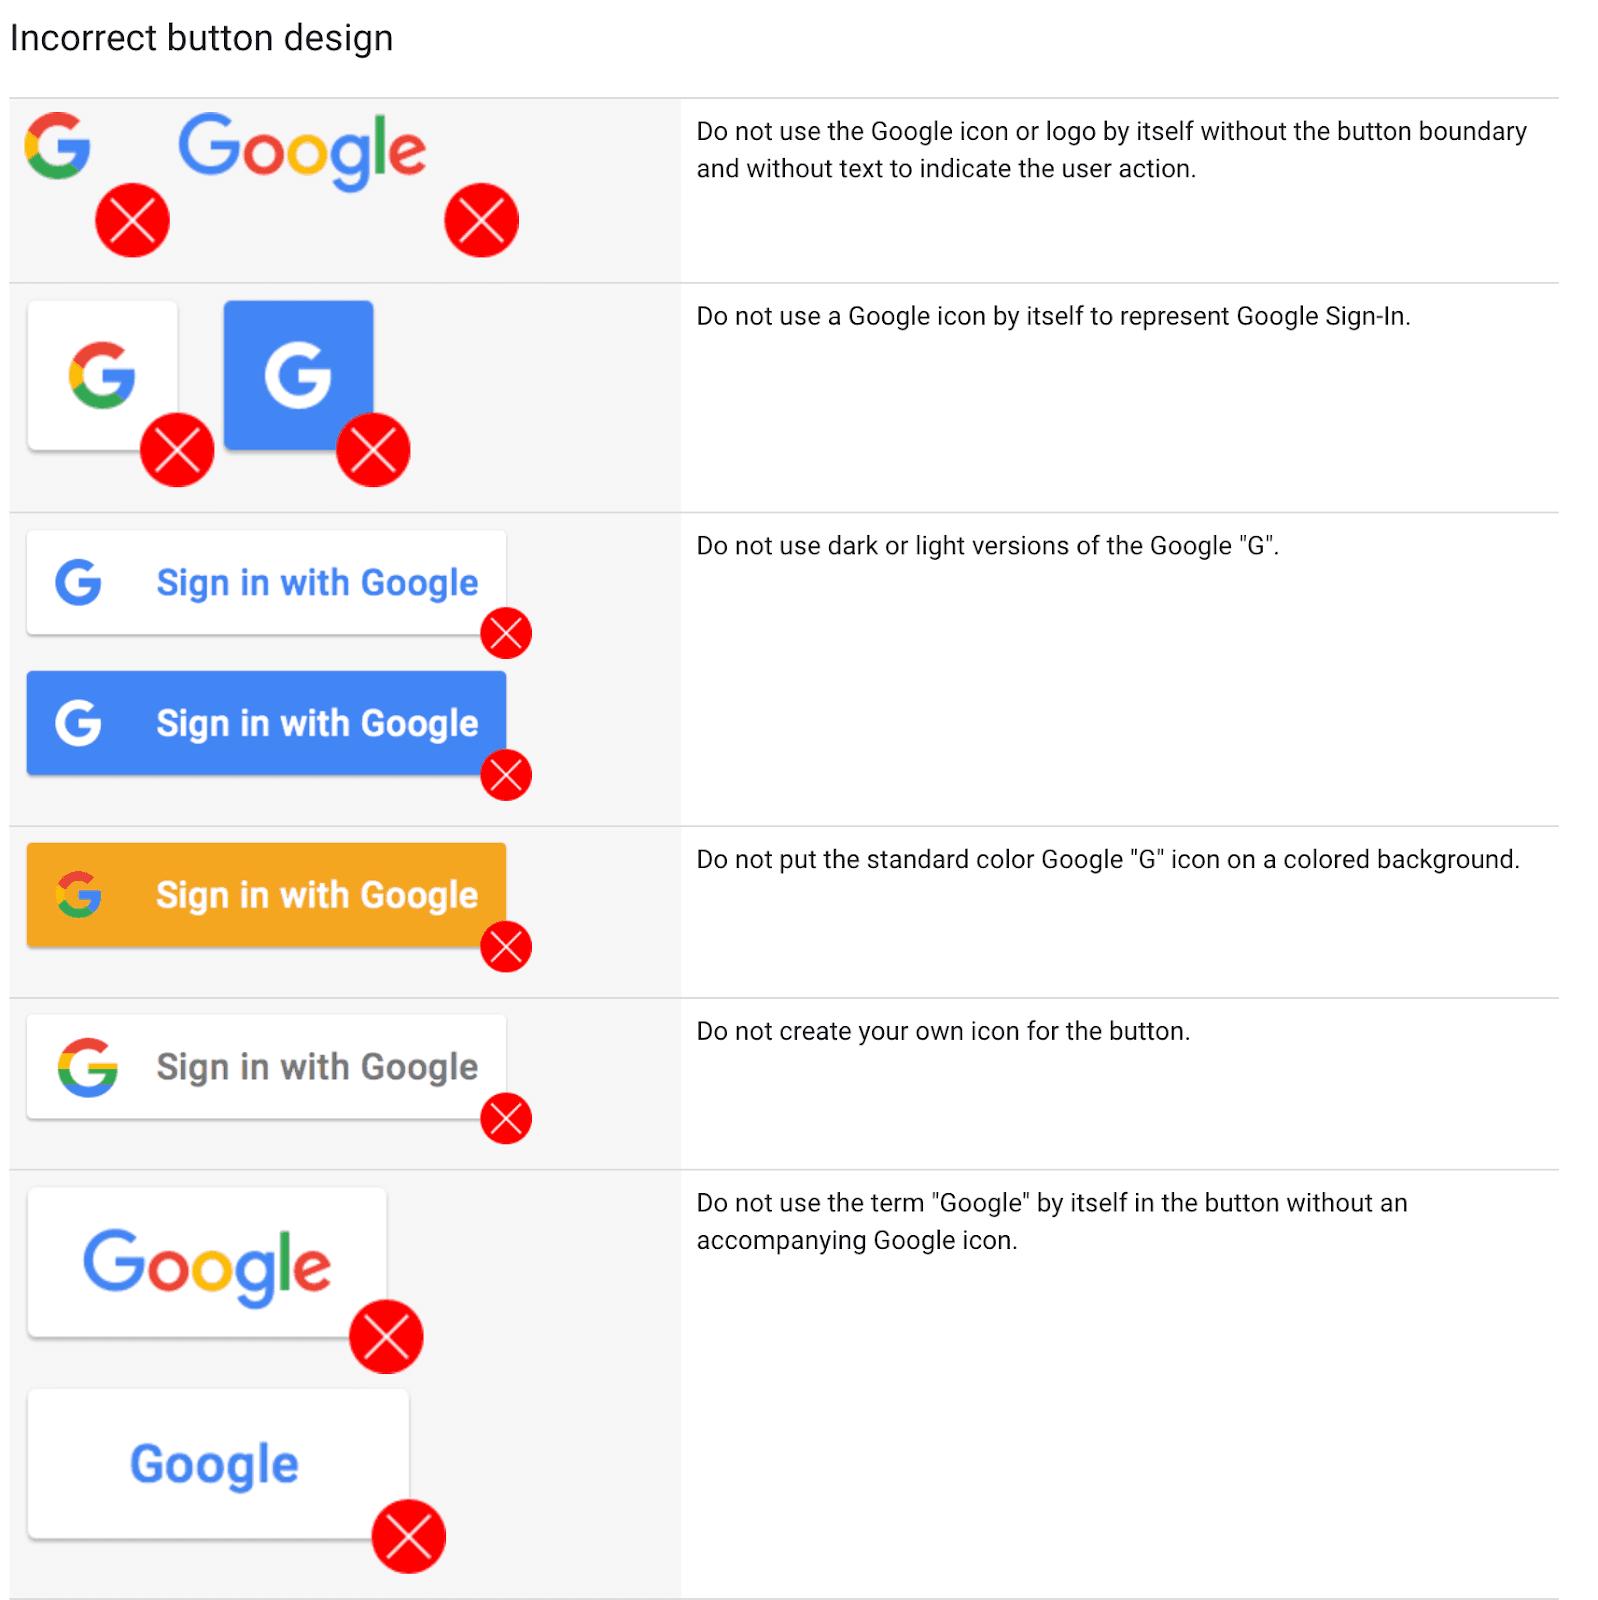 Incorrect Google button design